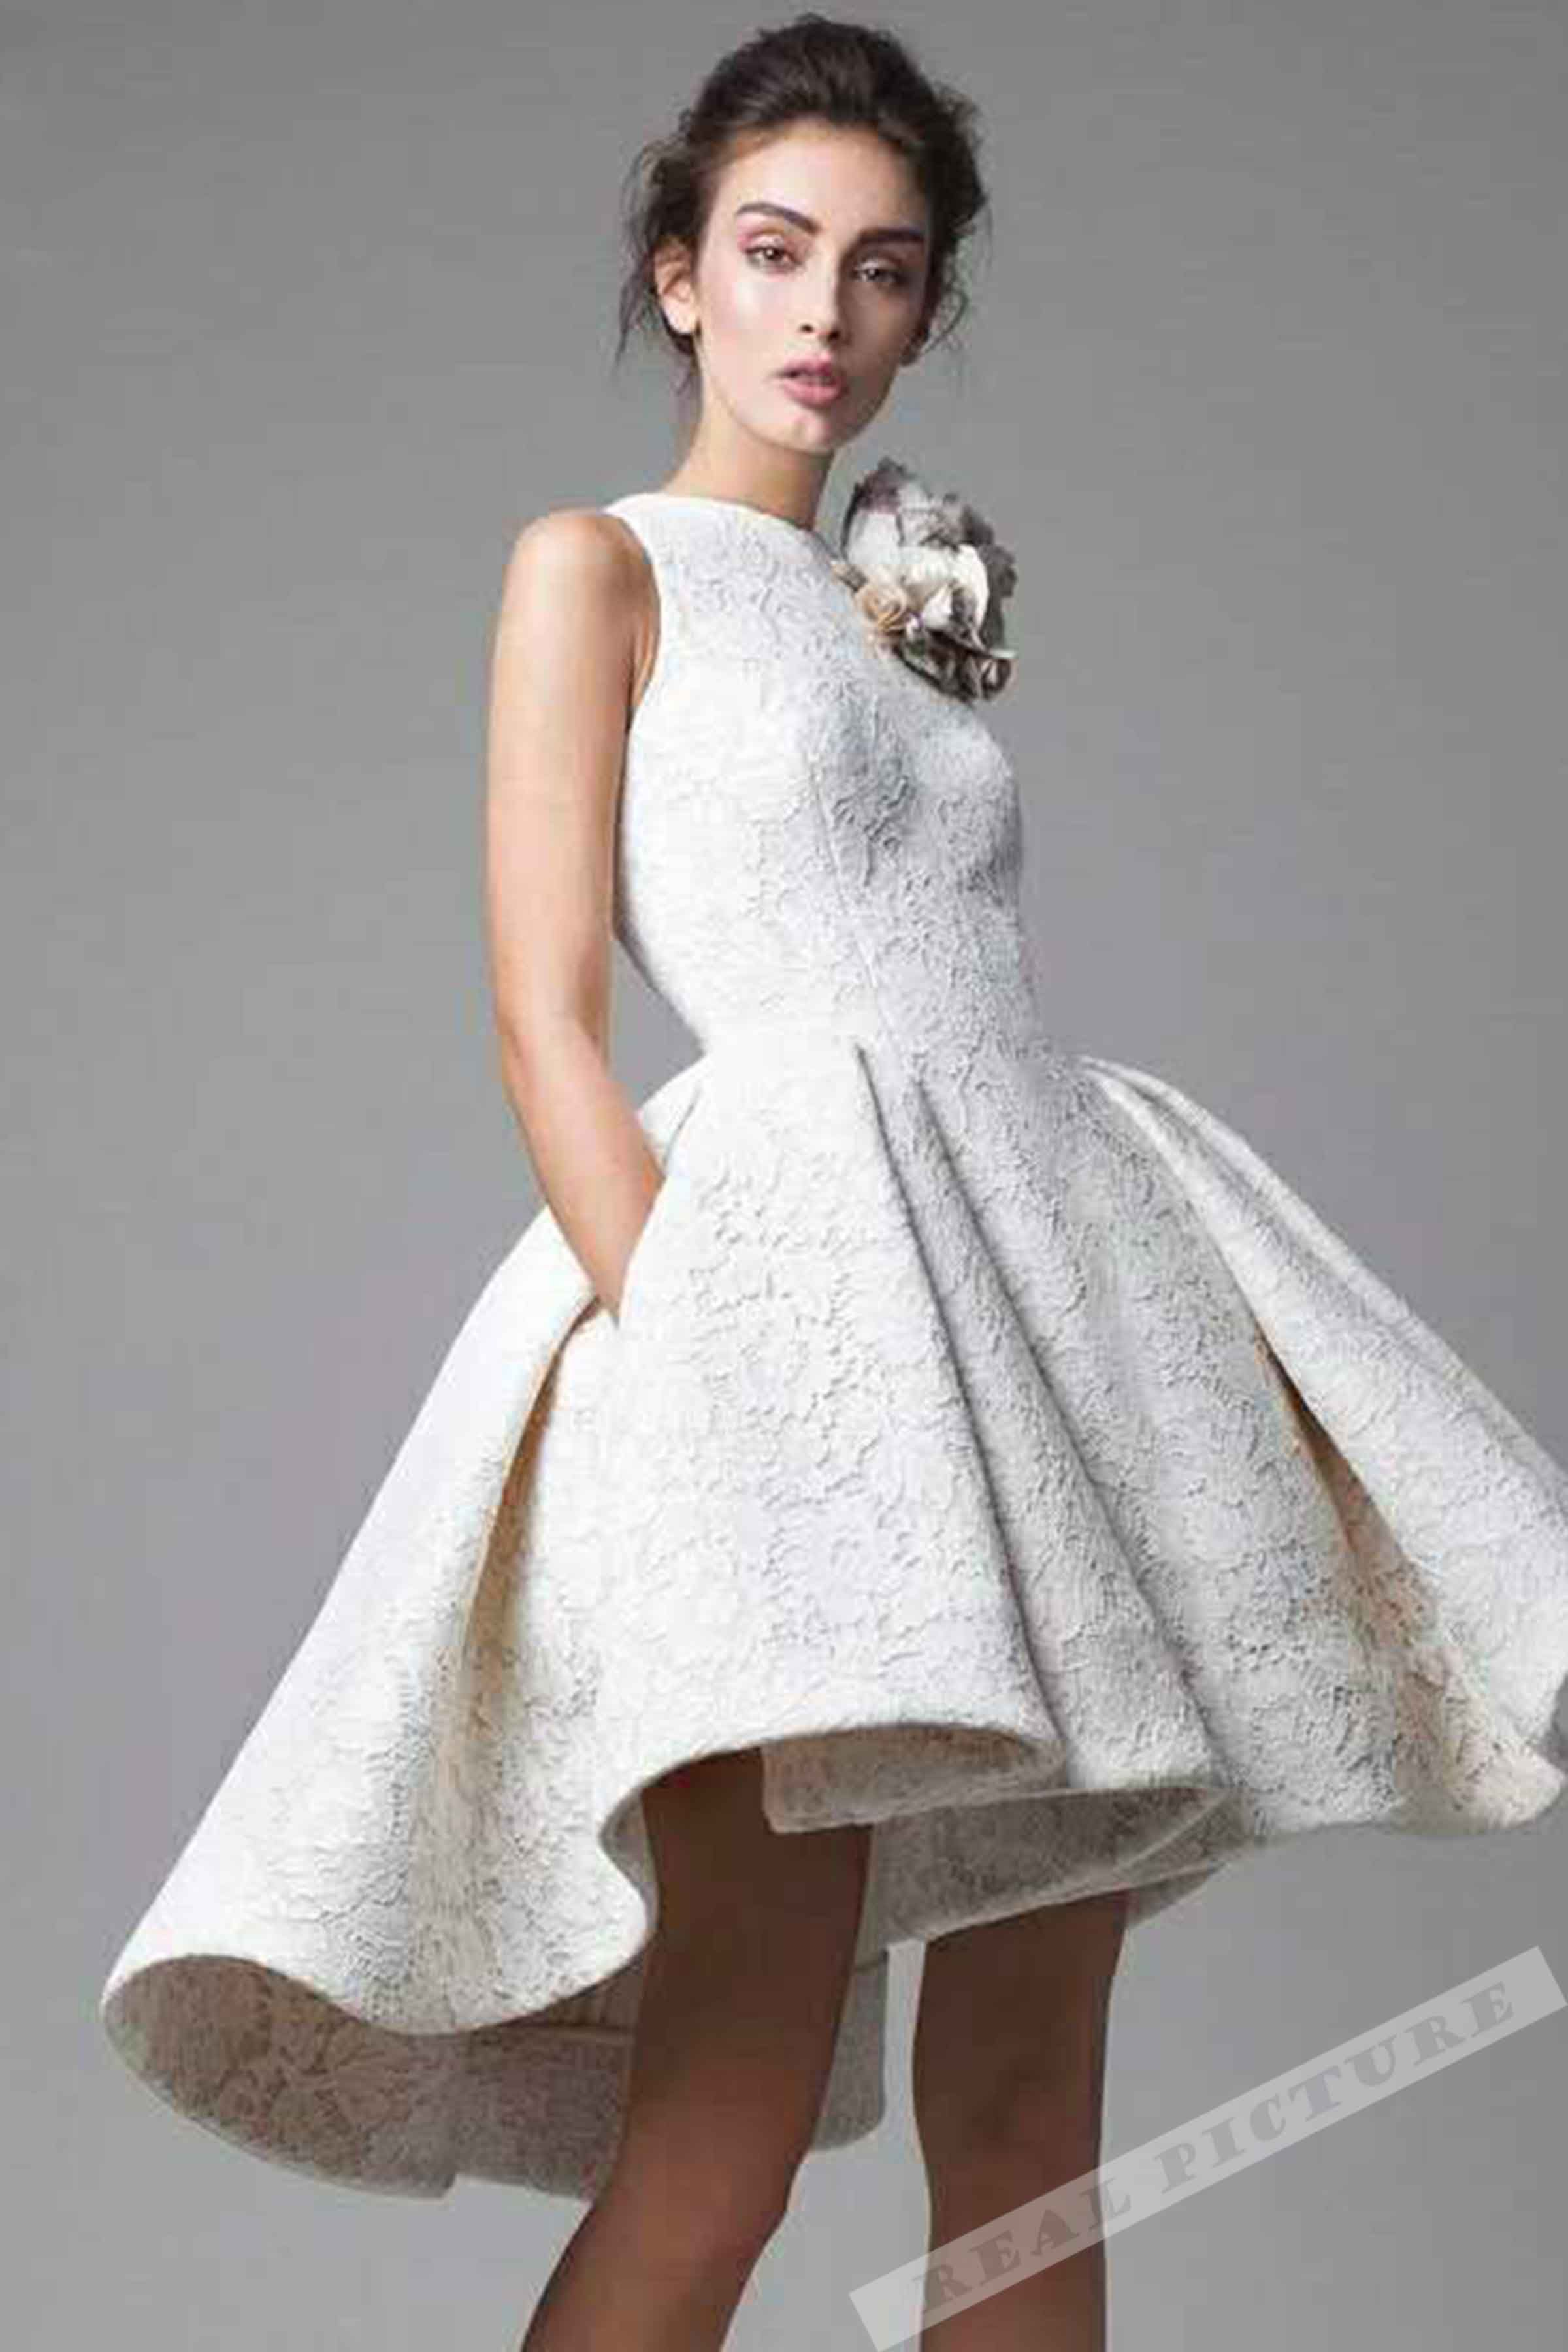 White lace high low prom dress, homecoming dress, fashion prom dress ...